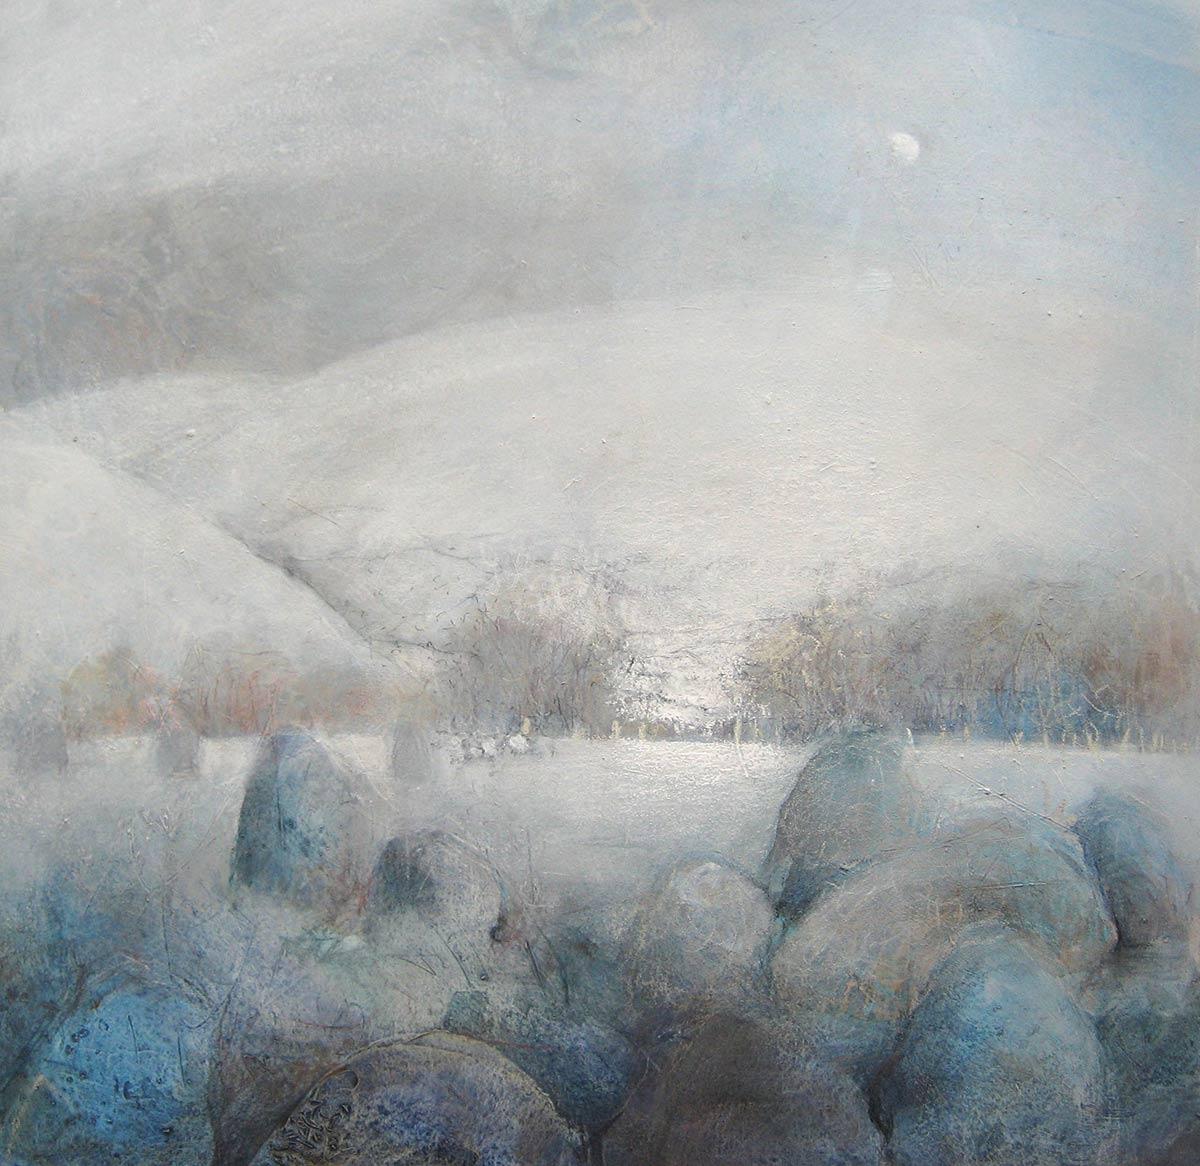 castlerigg stone circle, snow and half moon